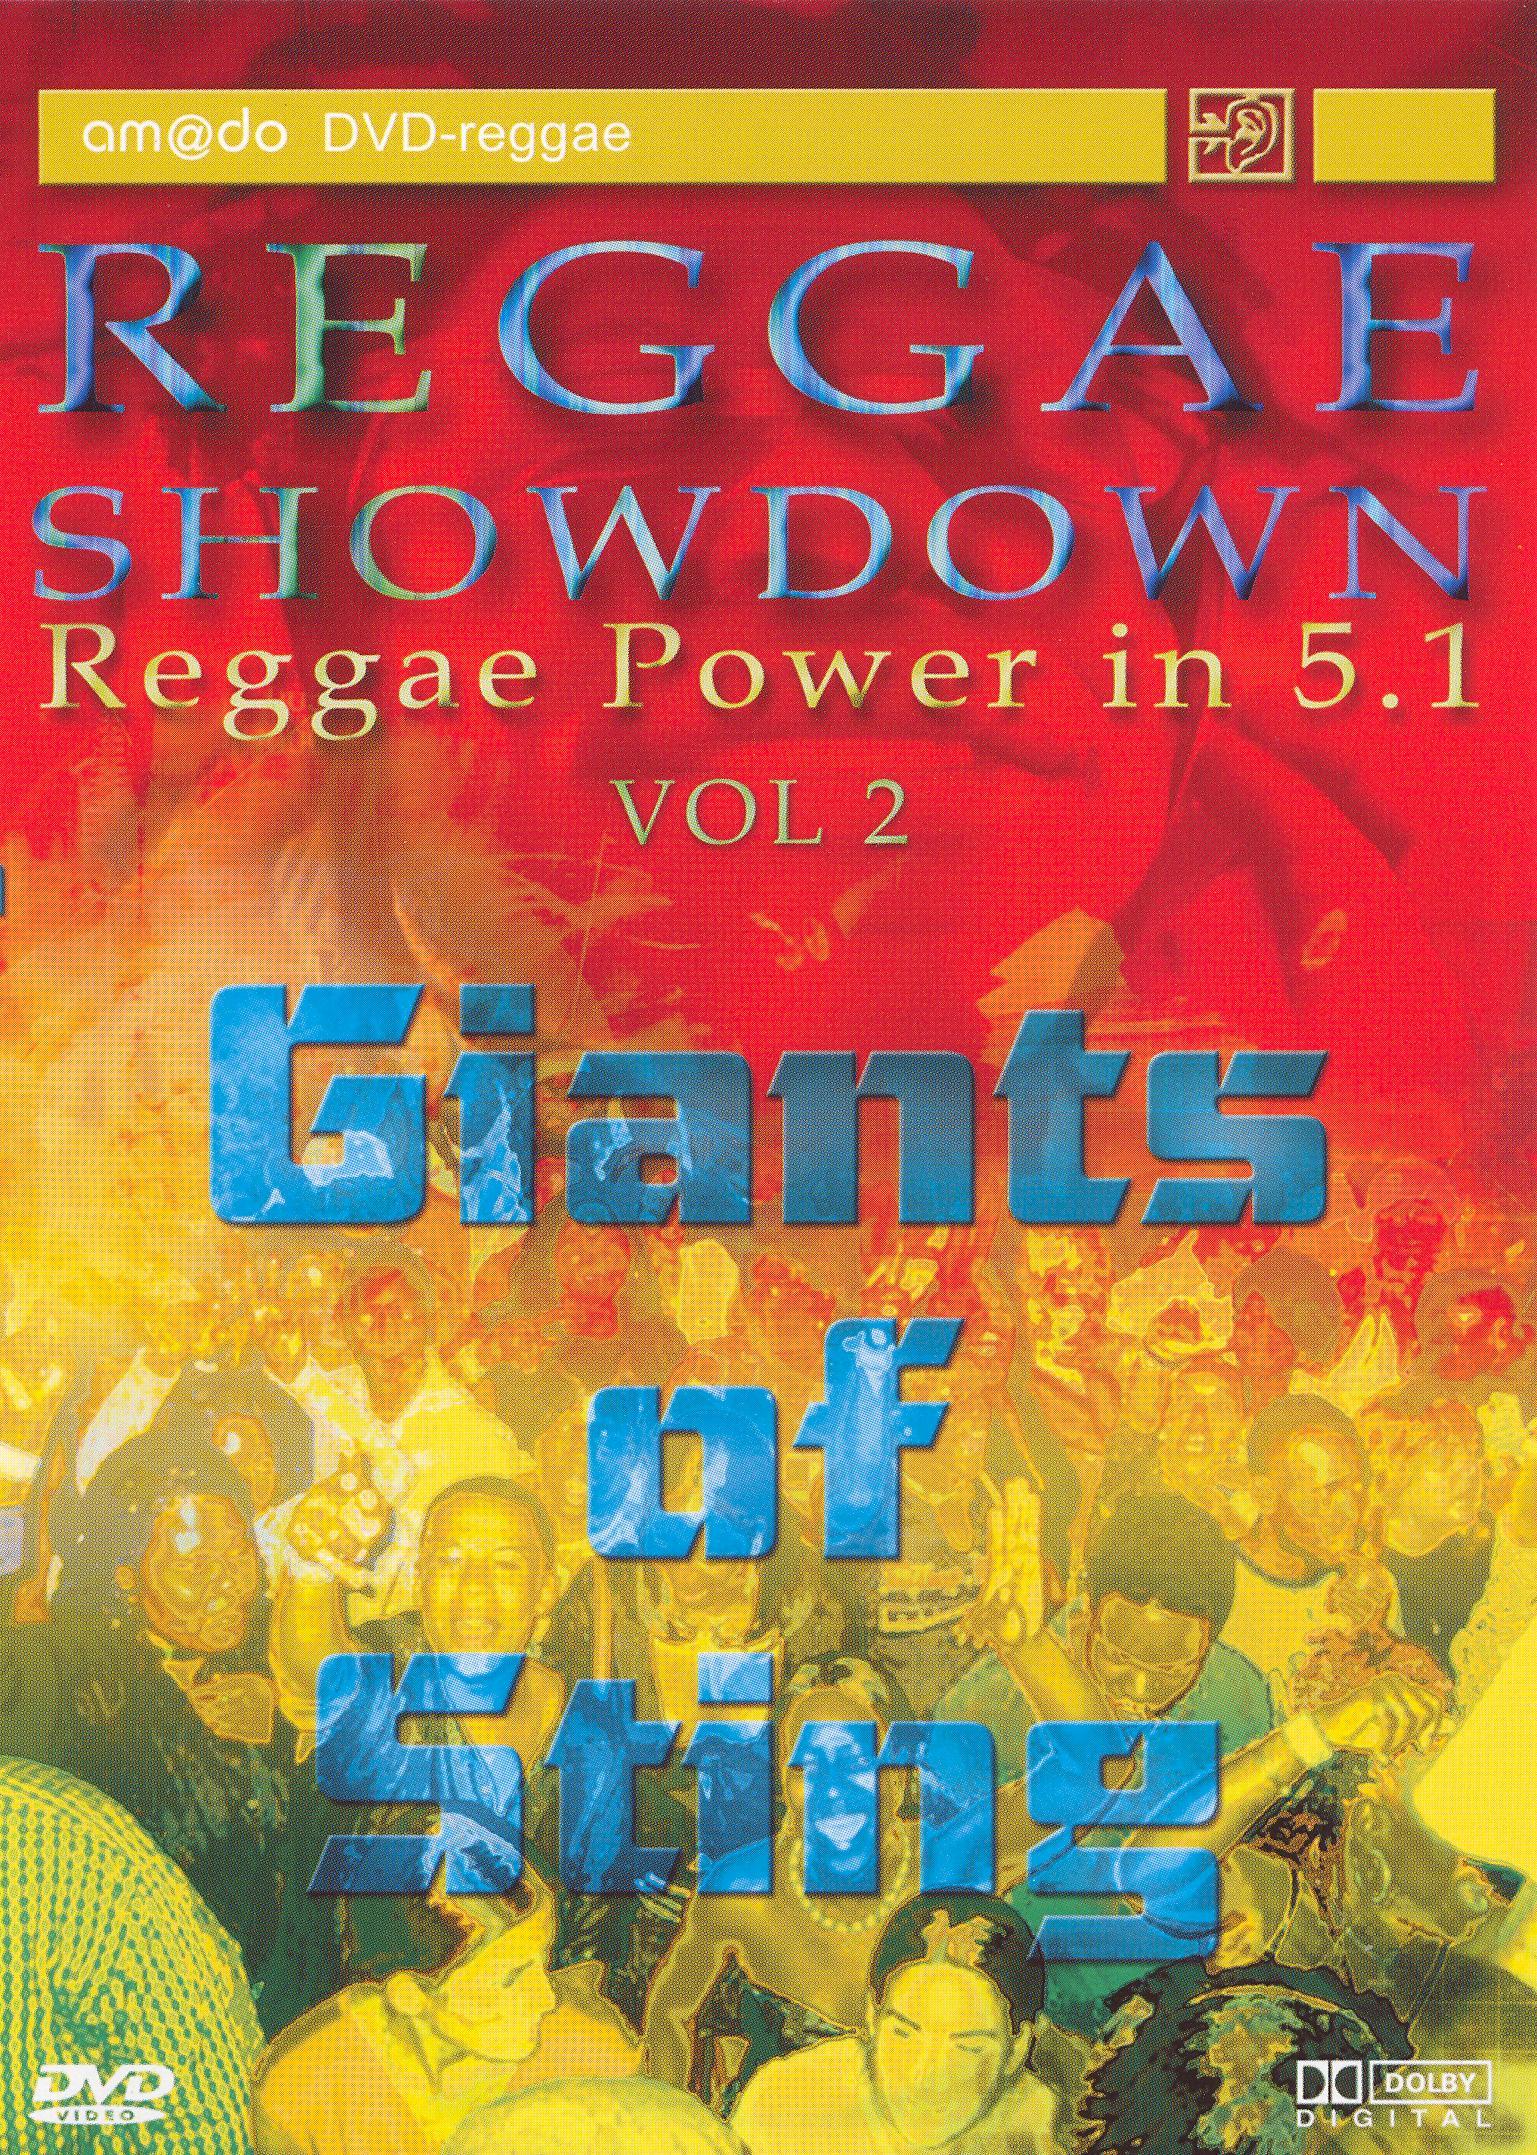 Reggae Showdown, Vol. 2: Giants of Sting